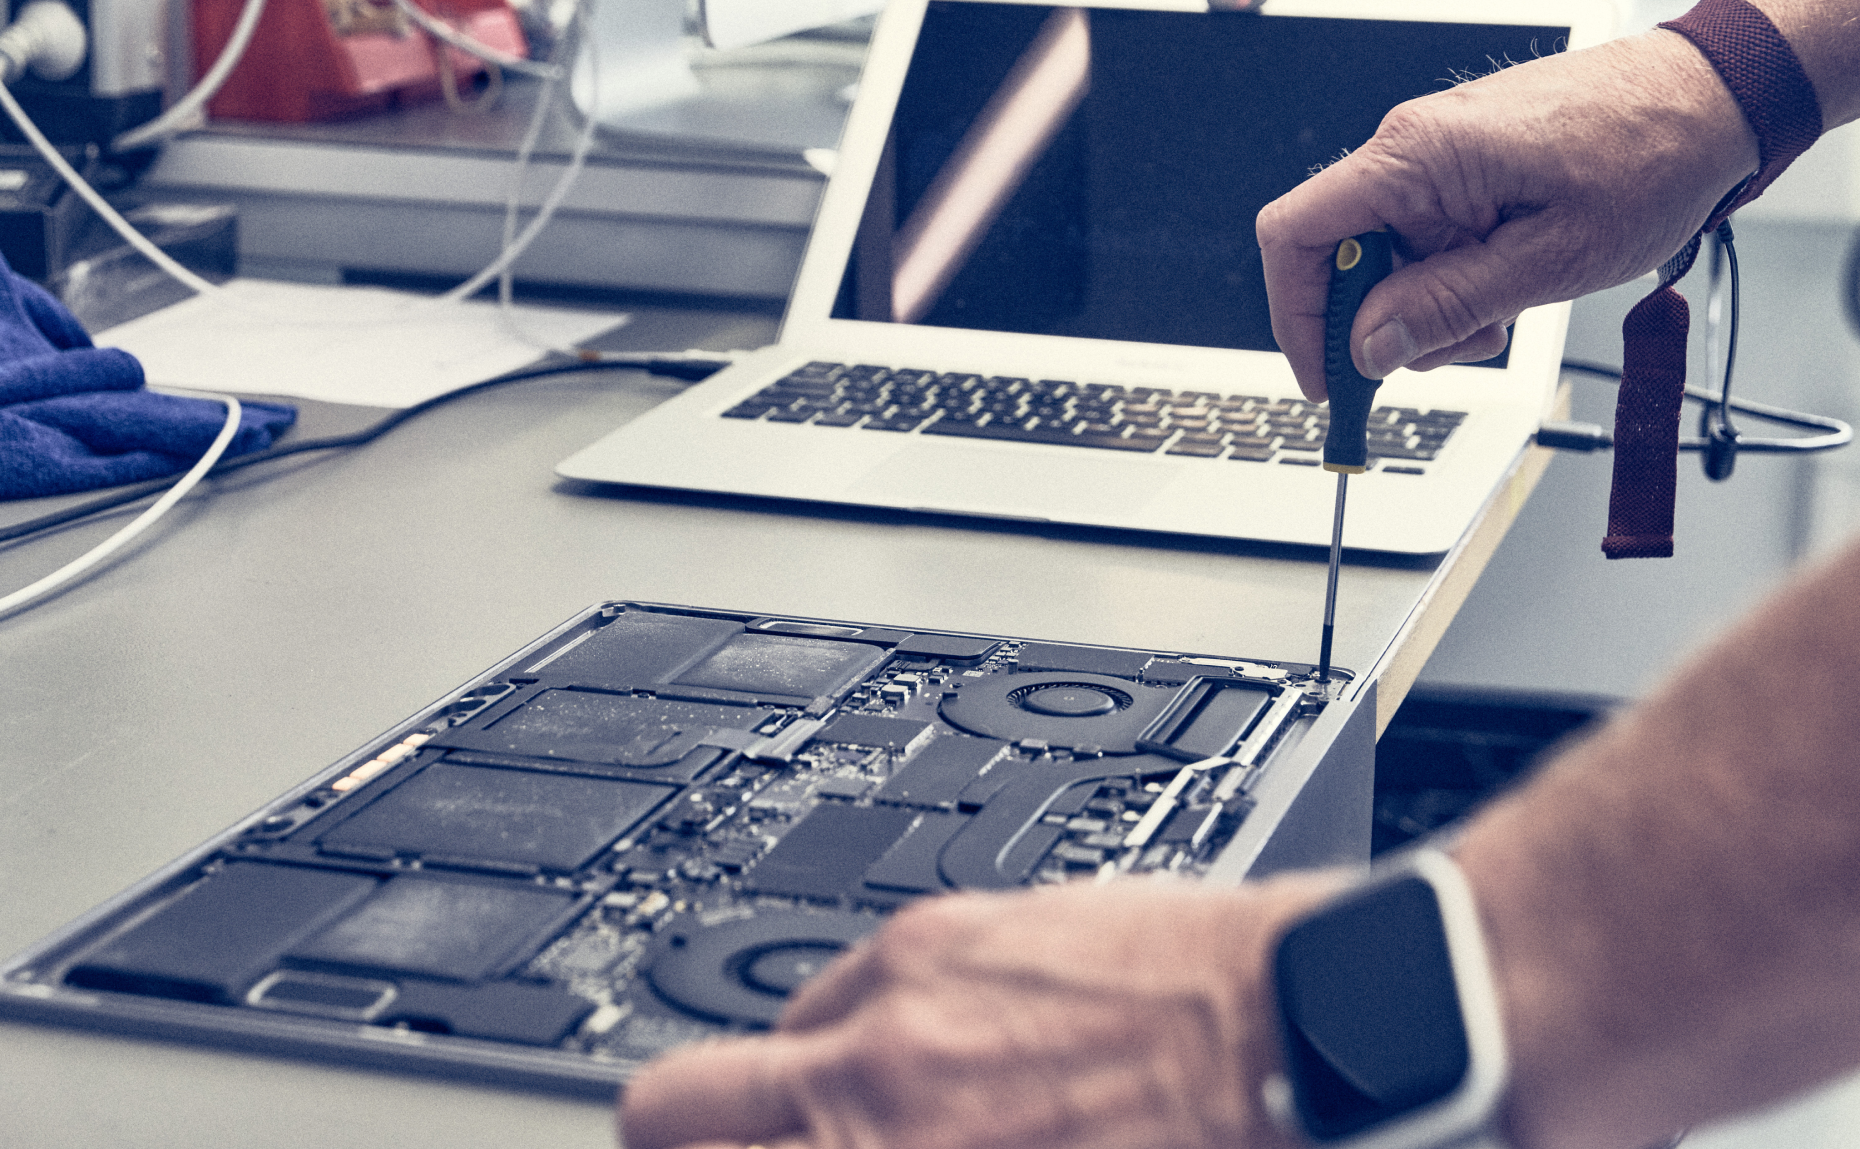 A macOS technician works on a MacBook.